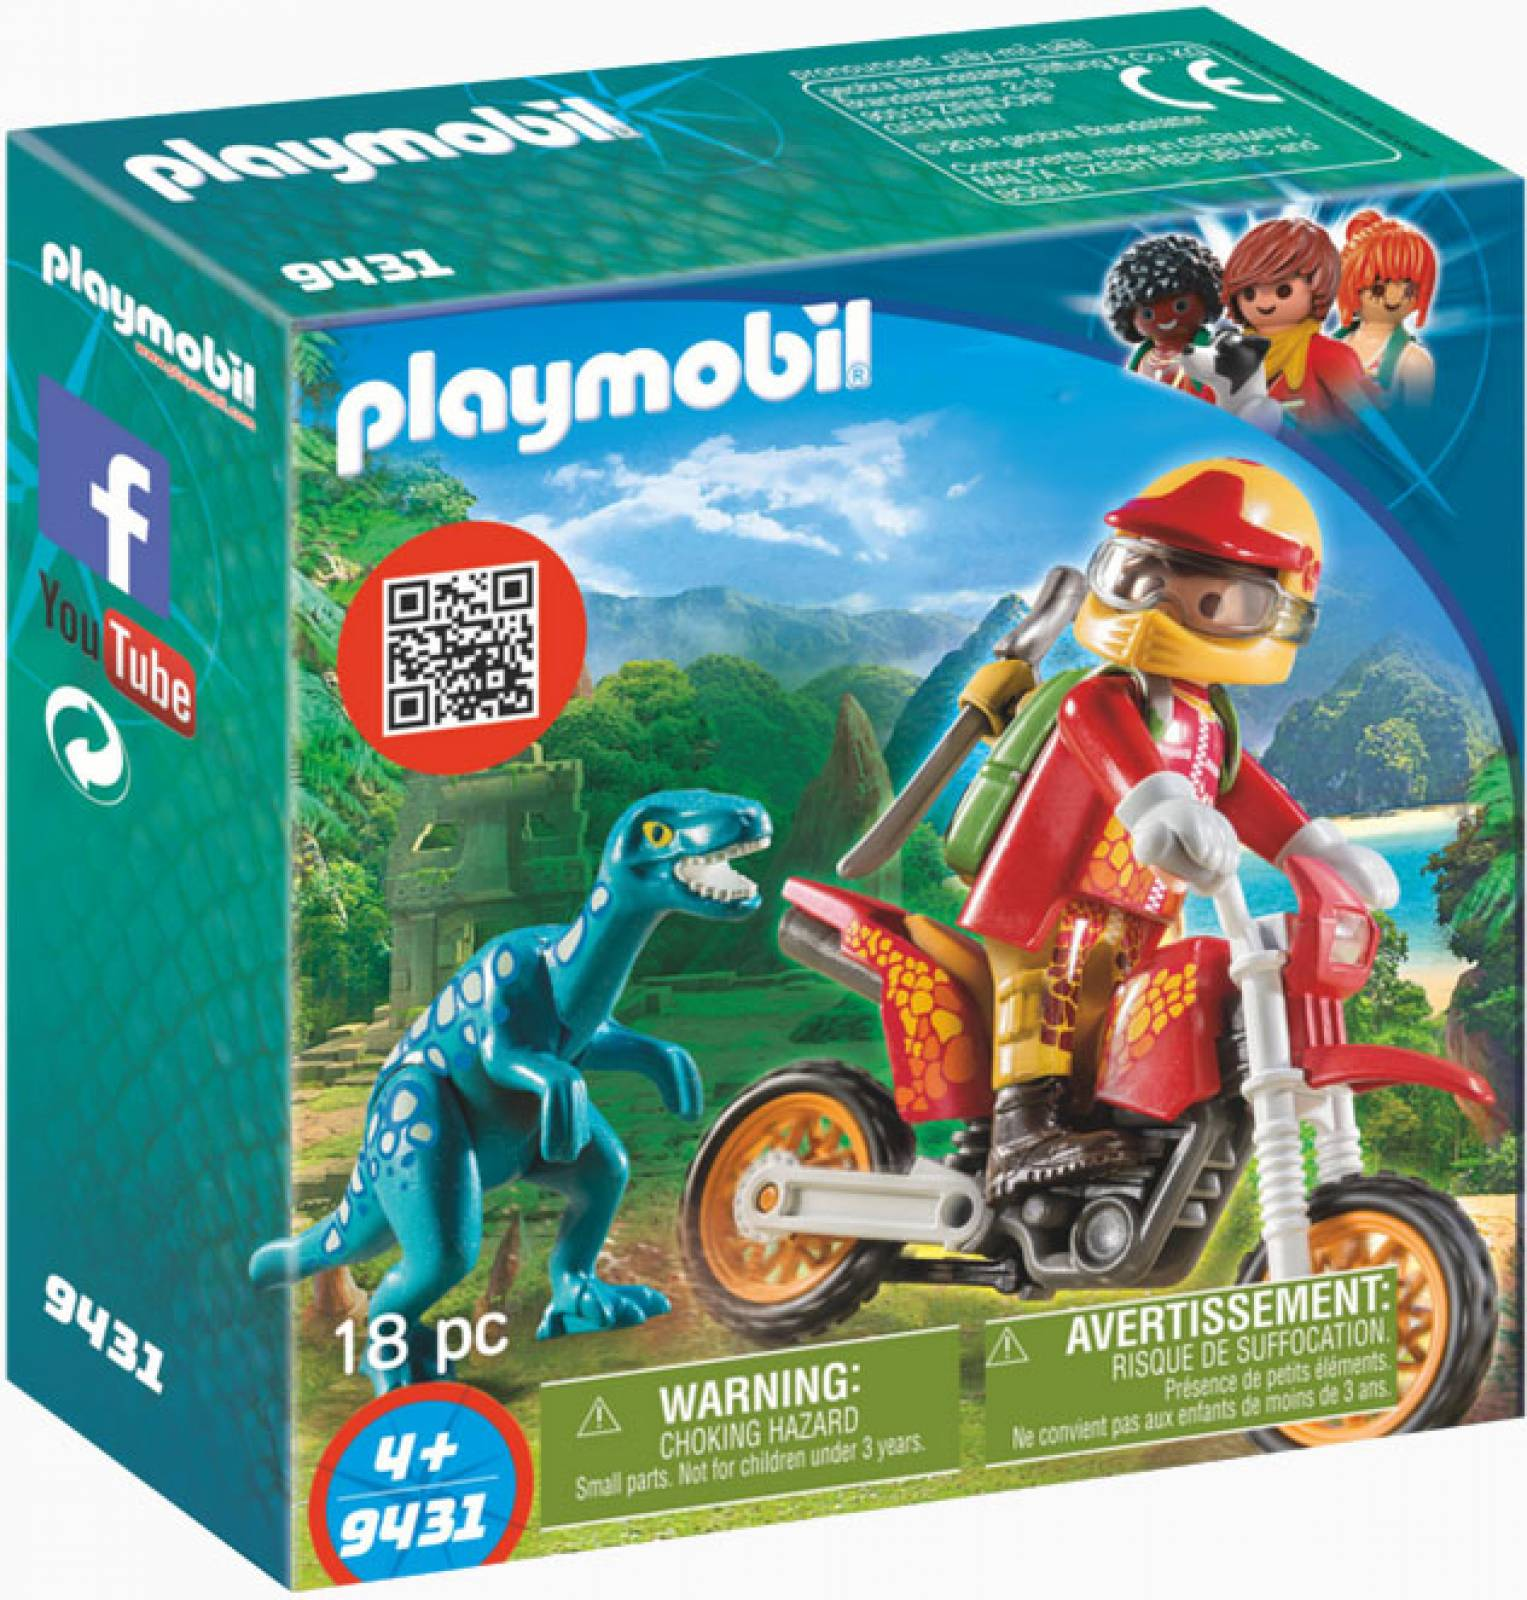 Motorcross Bike With Raptor Playmobil Dinosaurs 9431 thumbnails